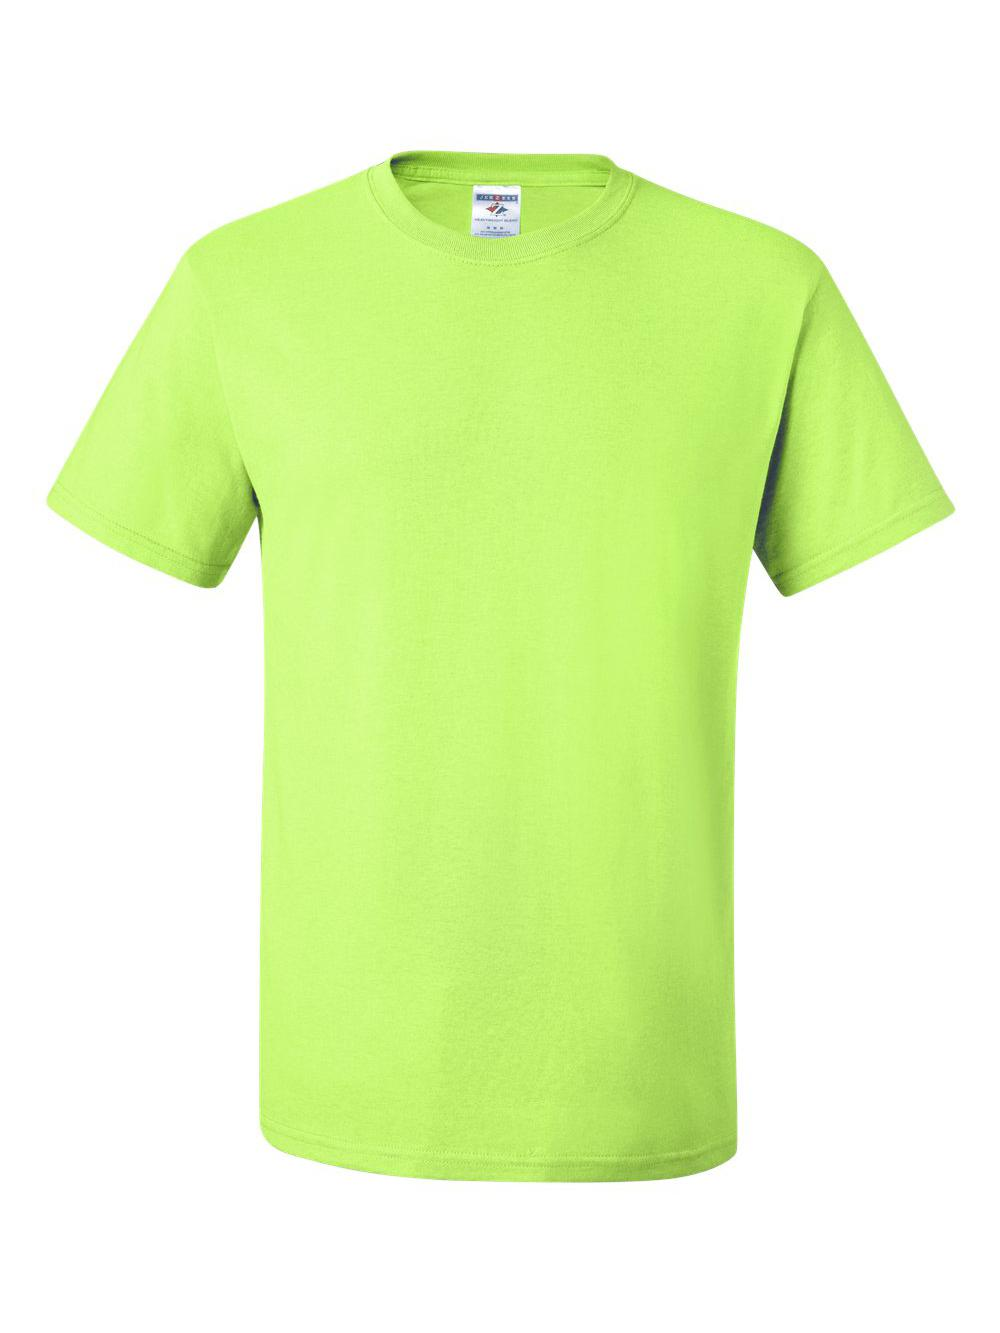 Jerzees-Dri-Power-50-50-T-Shirt-29MR thumbnail 105